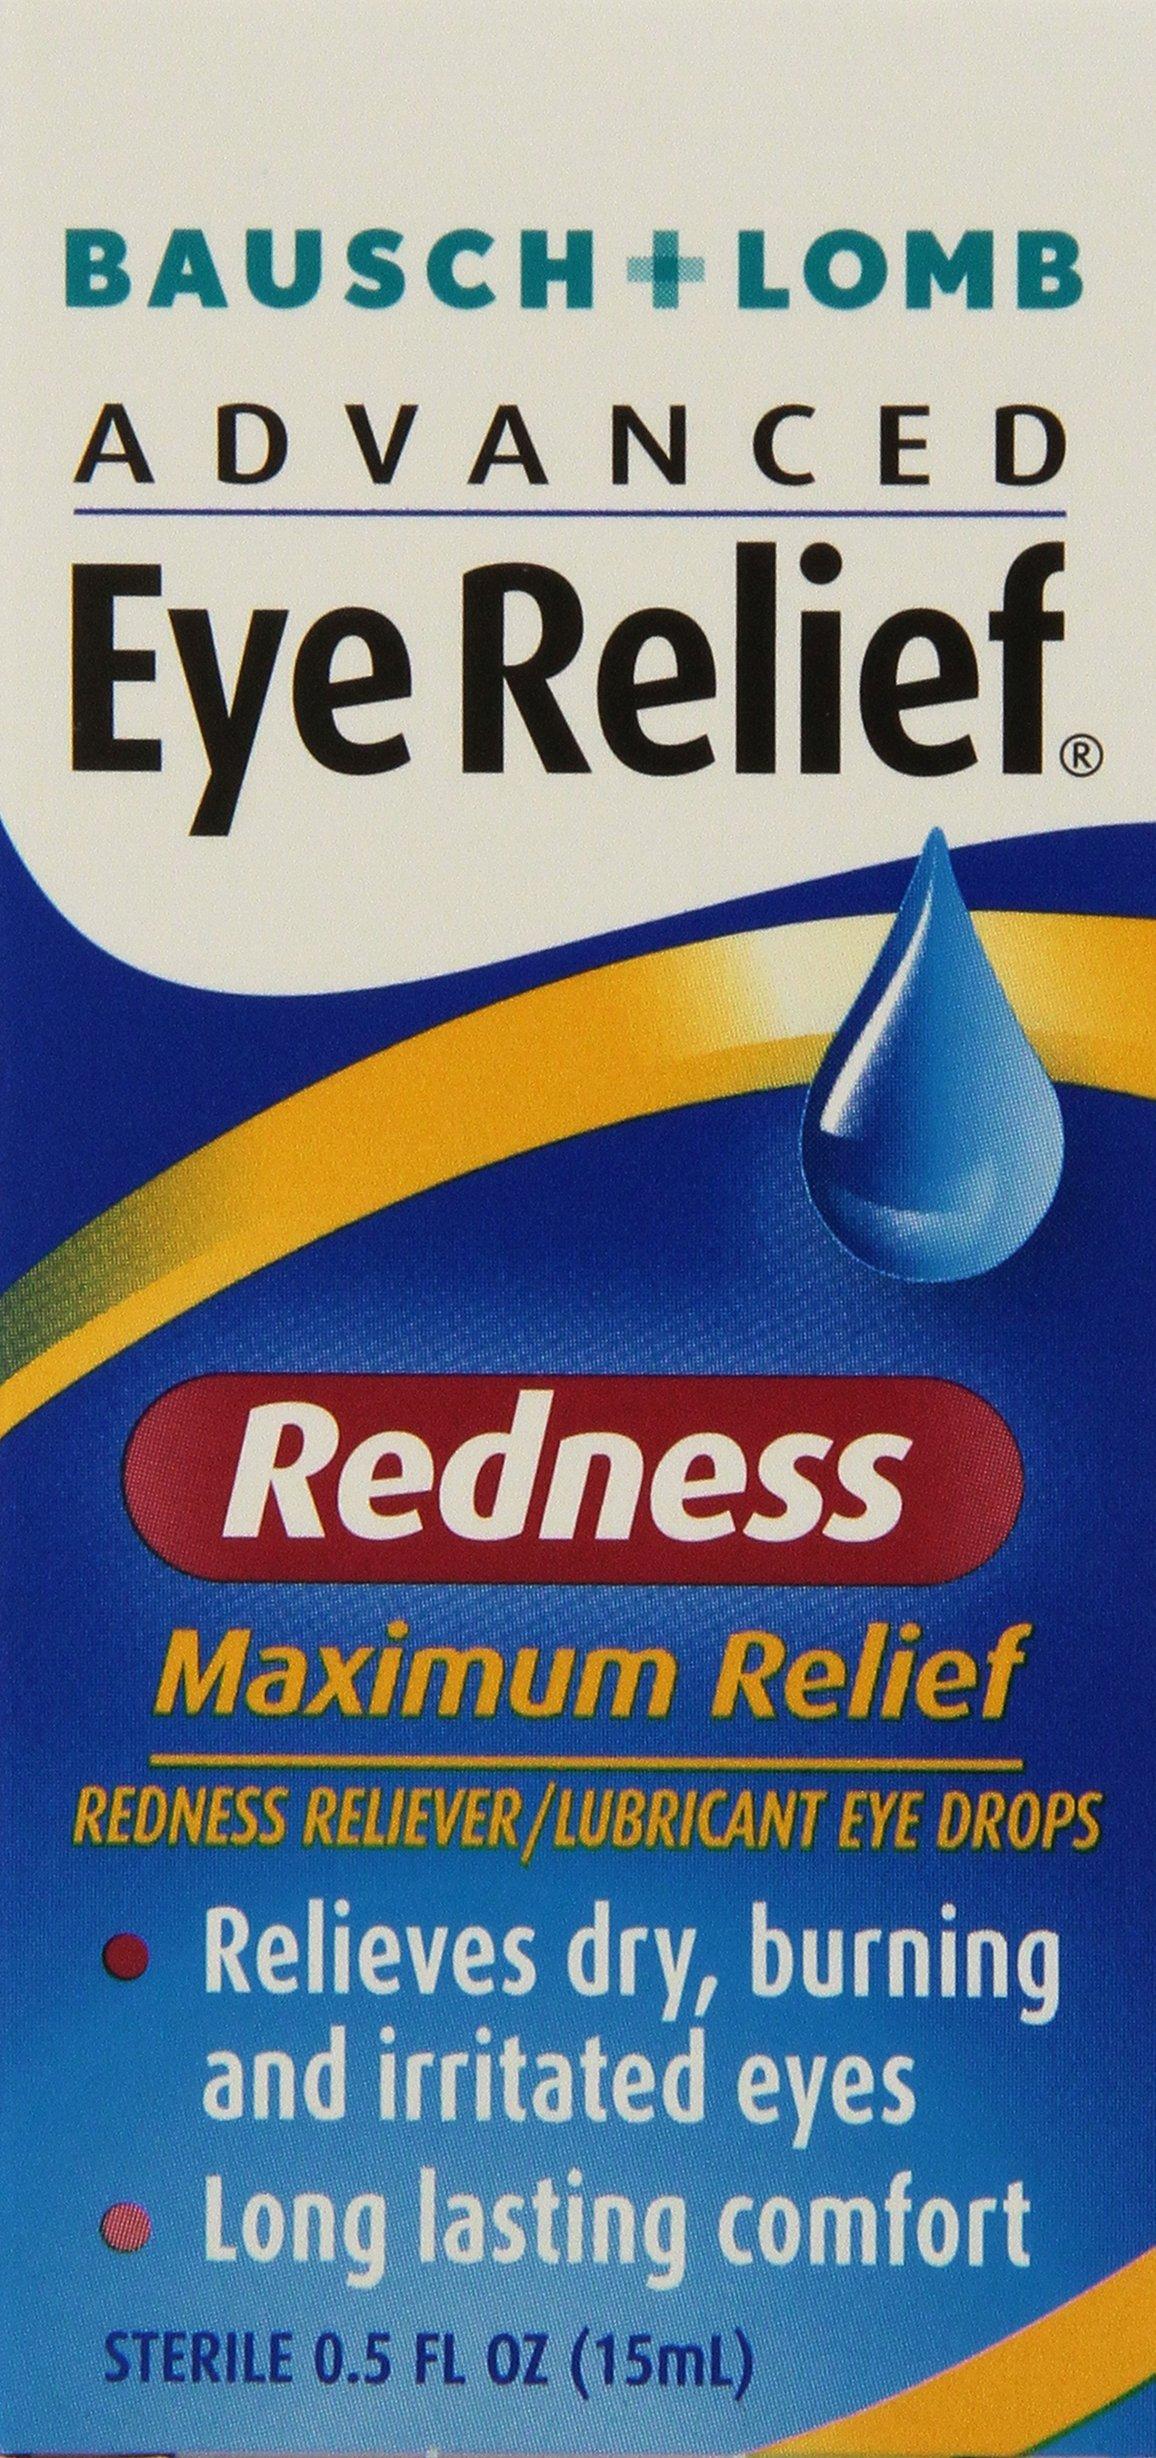 Bausch + Lomb Advanced Eye Relief Maximum Redness Reliever, 0.5 Ounce